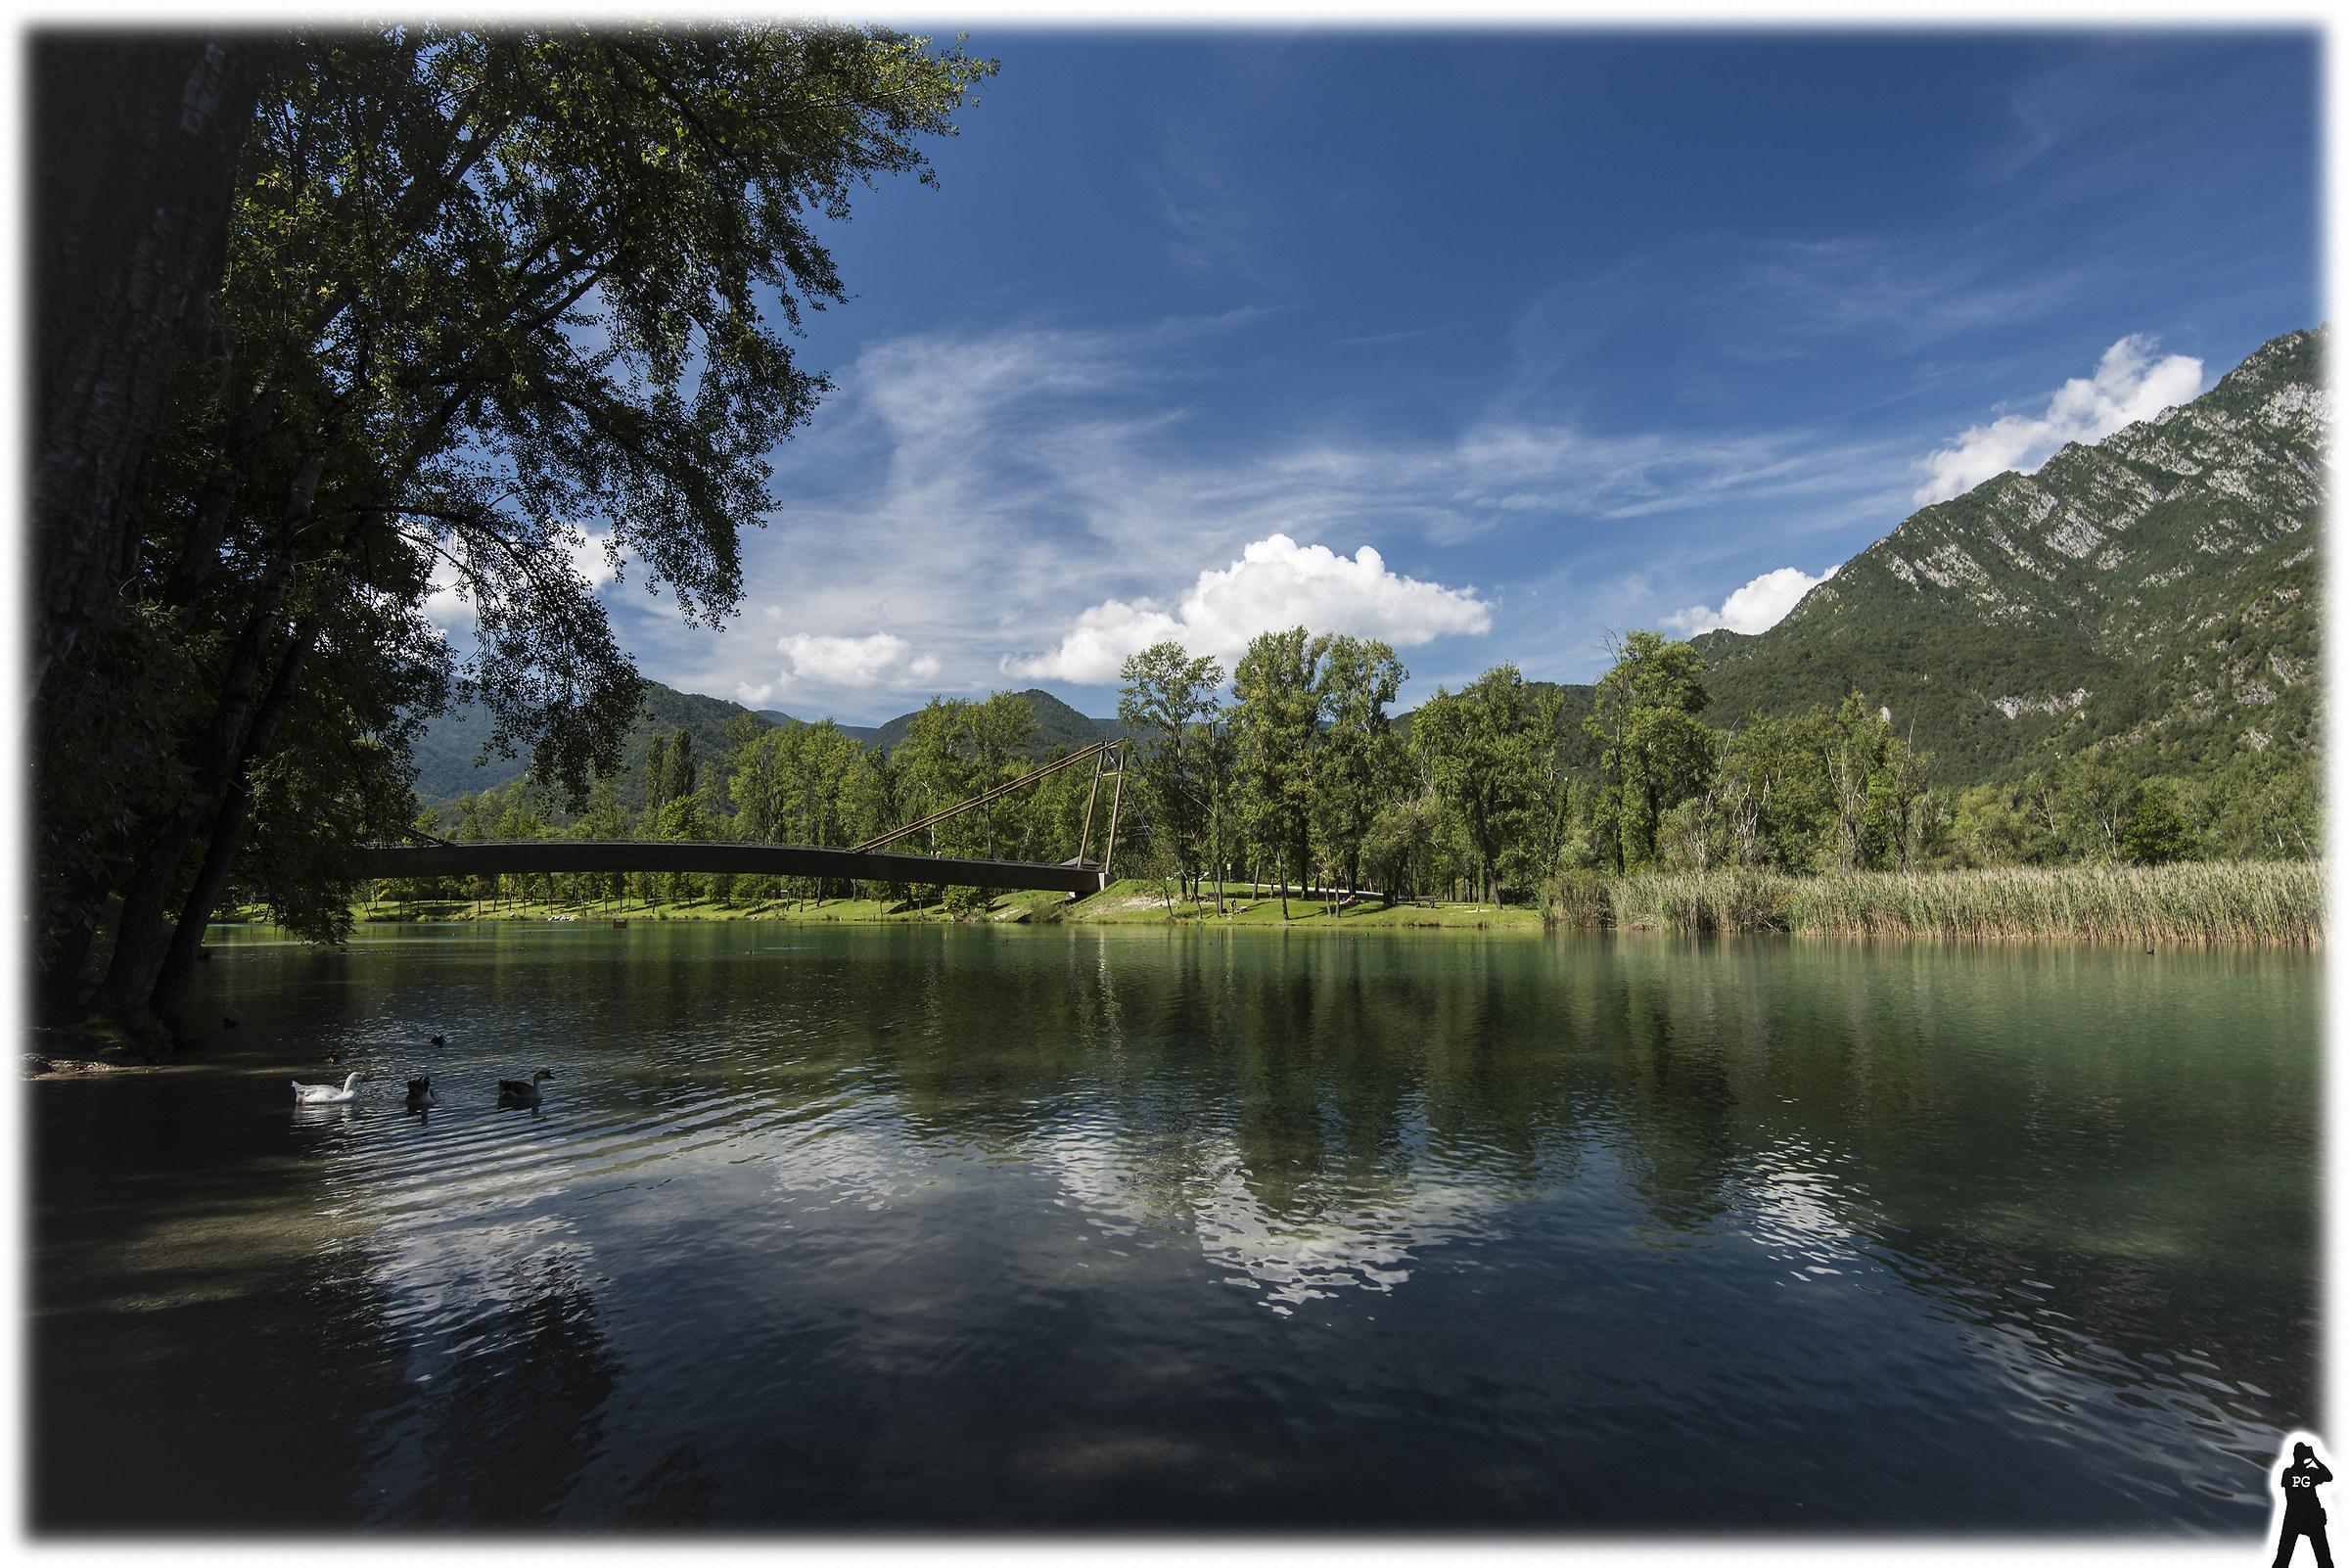 Lake Cavazzo 02 (or lake of 3 common borders or 3!)...